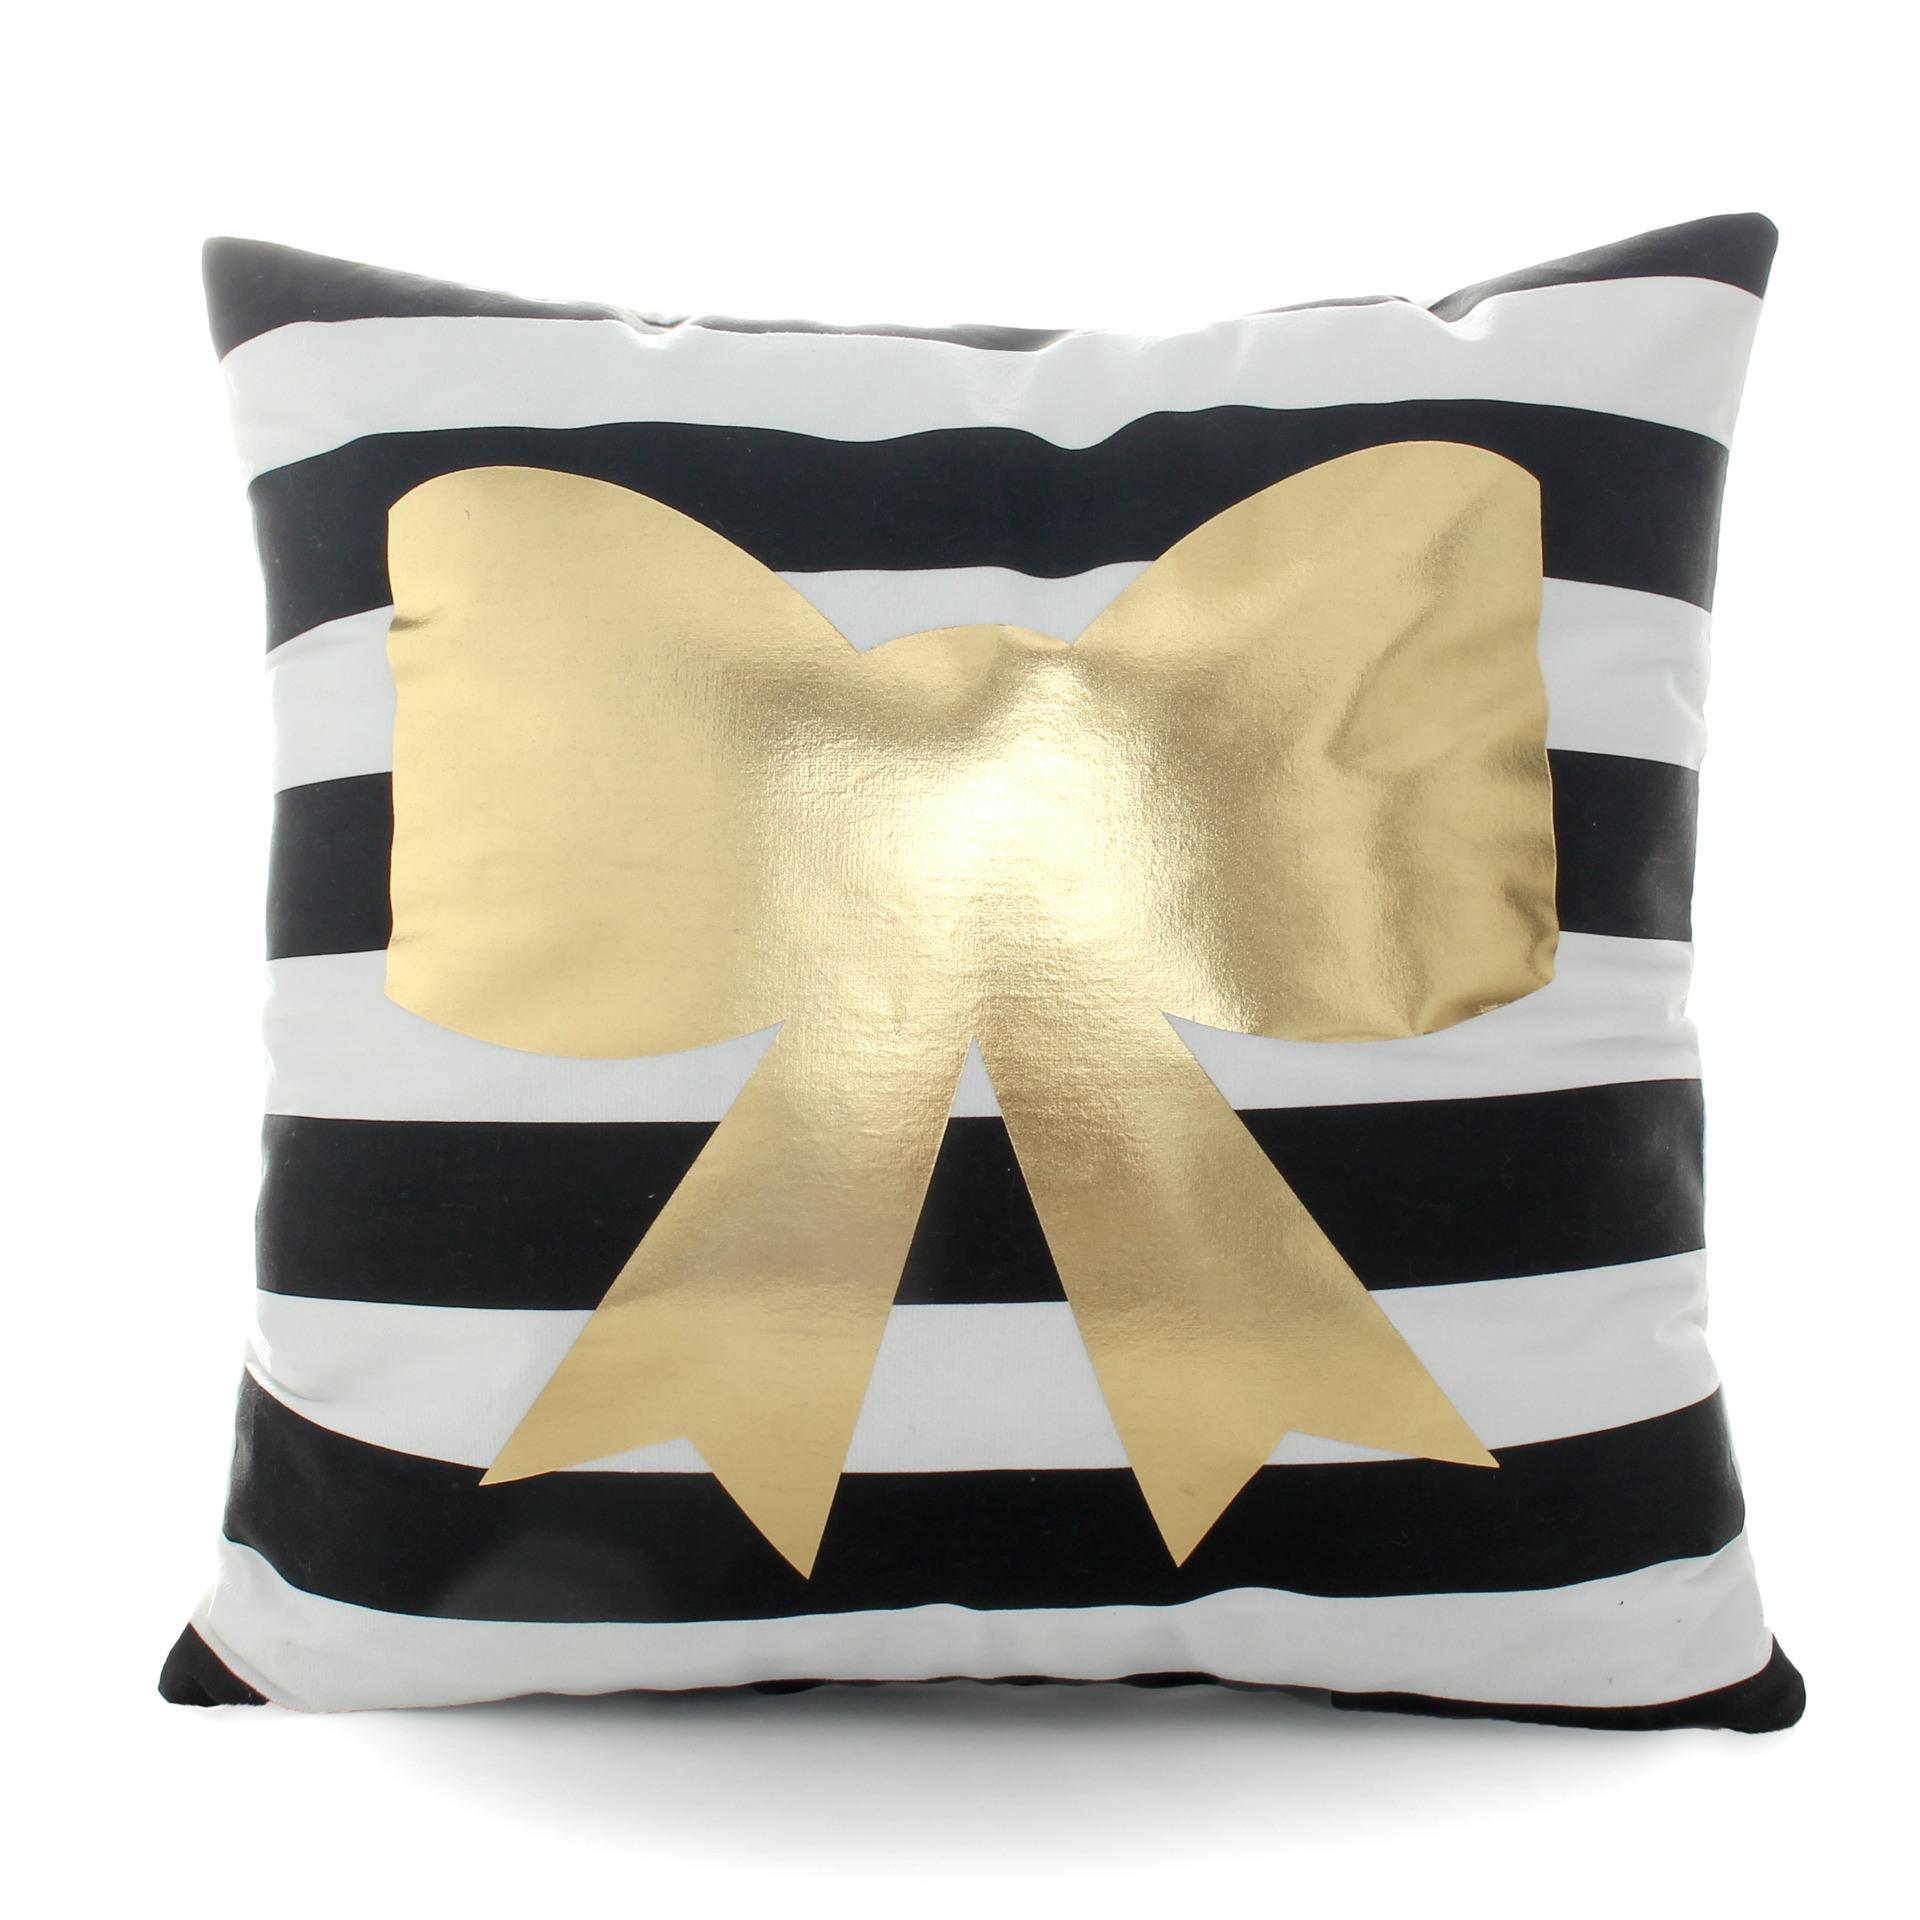 China Sofa Decorative Cushions Gold Foil Printing Pillow